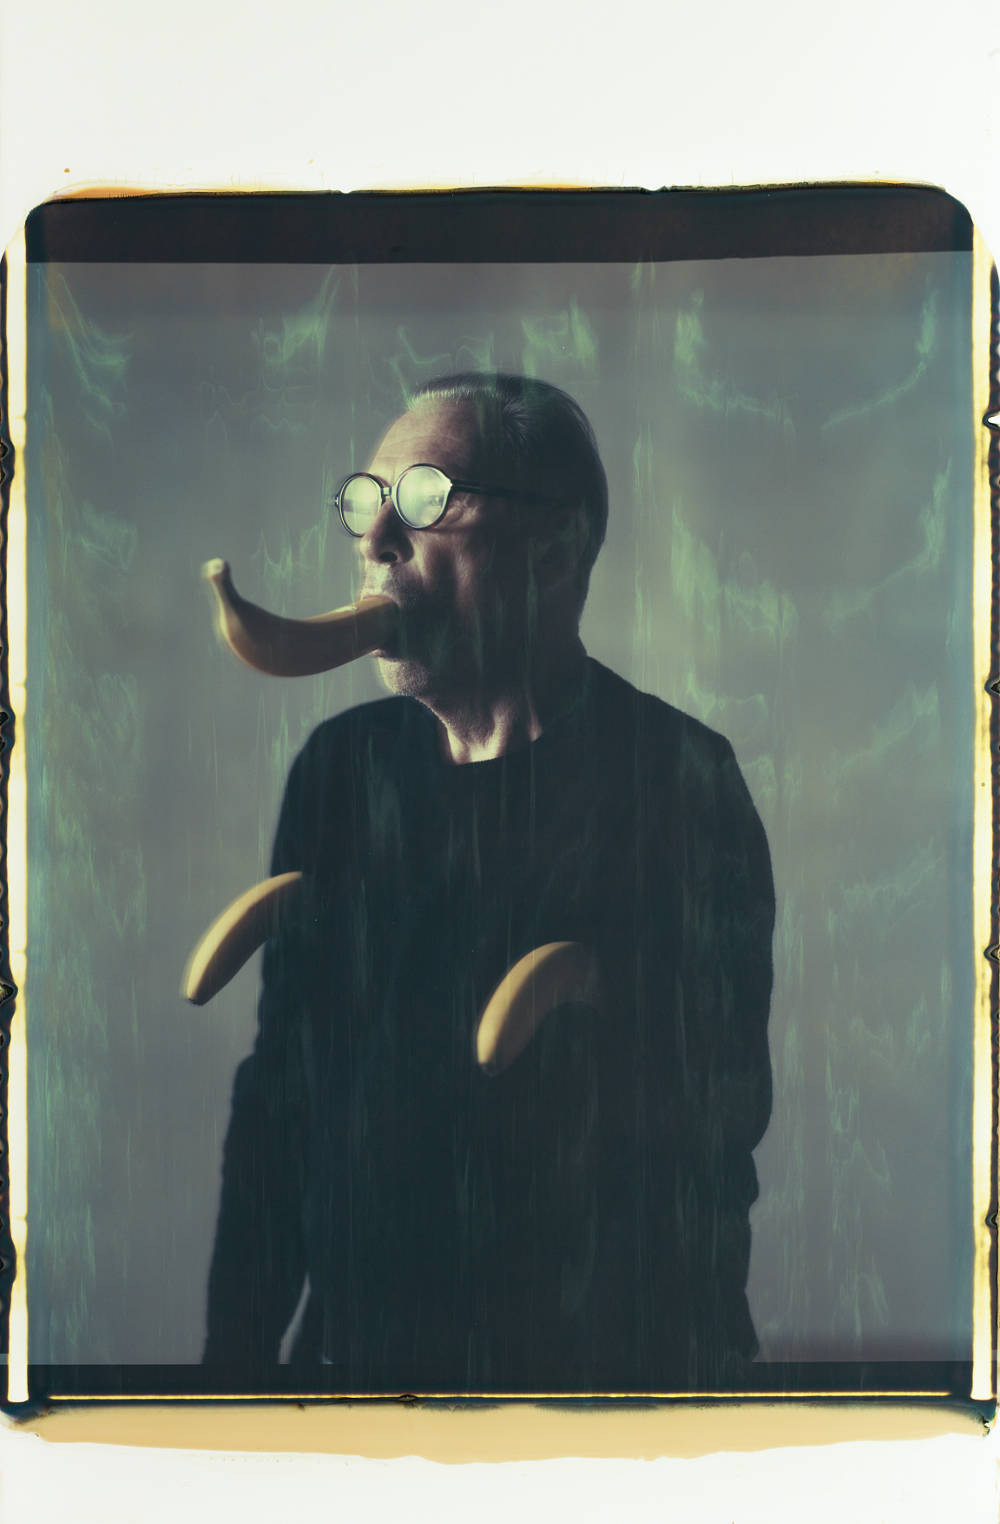 Erwin Wurm, Untitled, 2019. Polaroid image 56 x ca. 85 cm